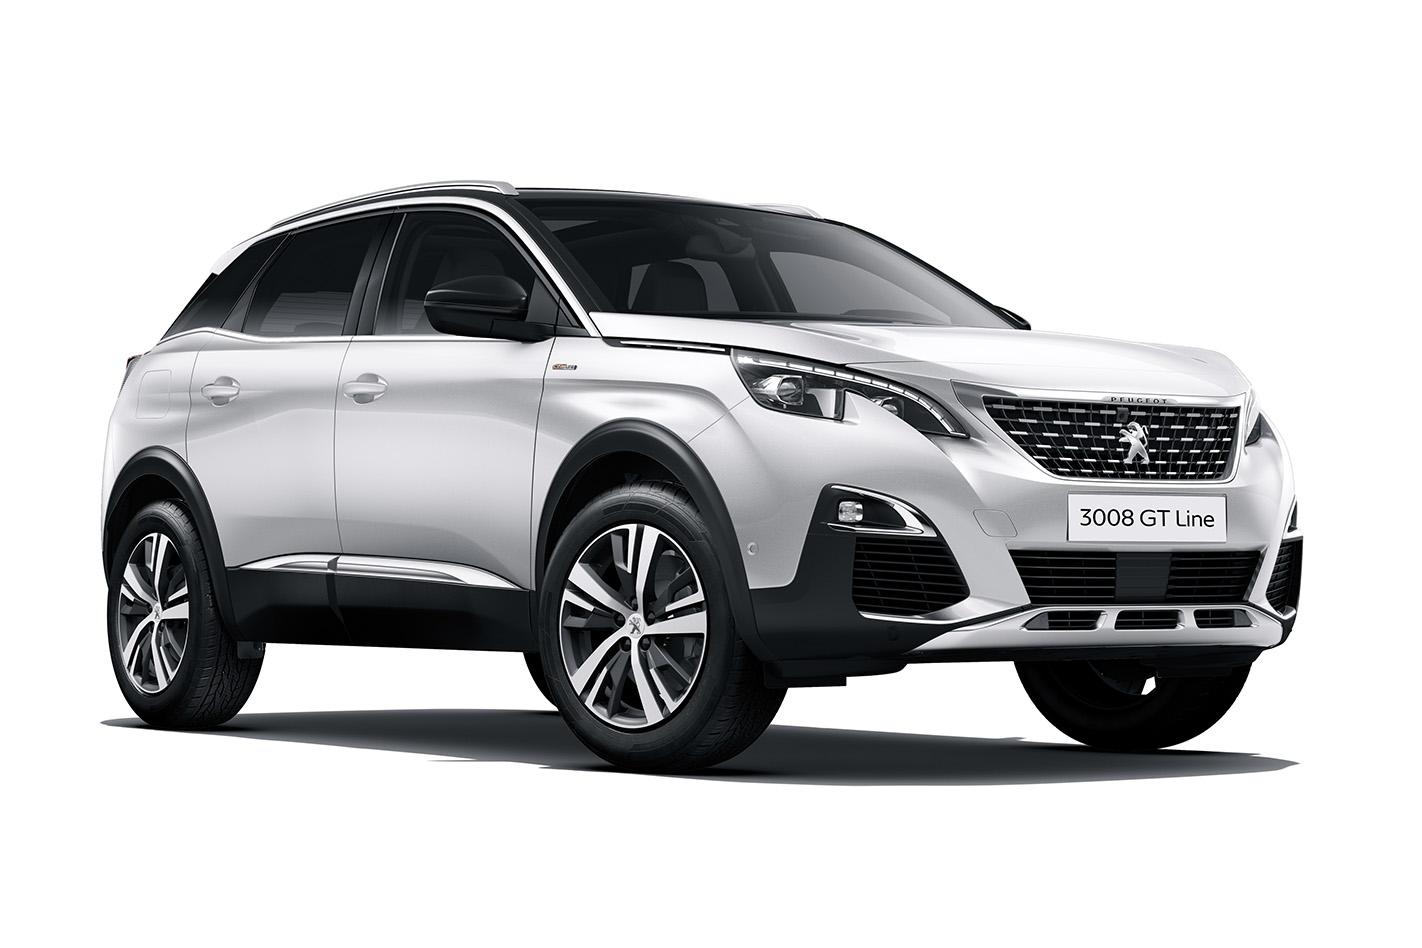 2019 Peugeot 3008 Gt Line 1 6l 4cyl Petrol Turbocharged Automatic Suv